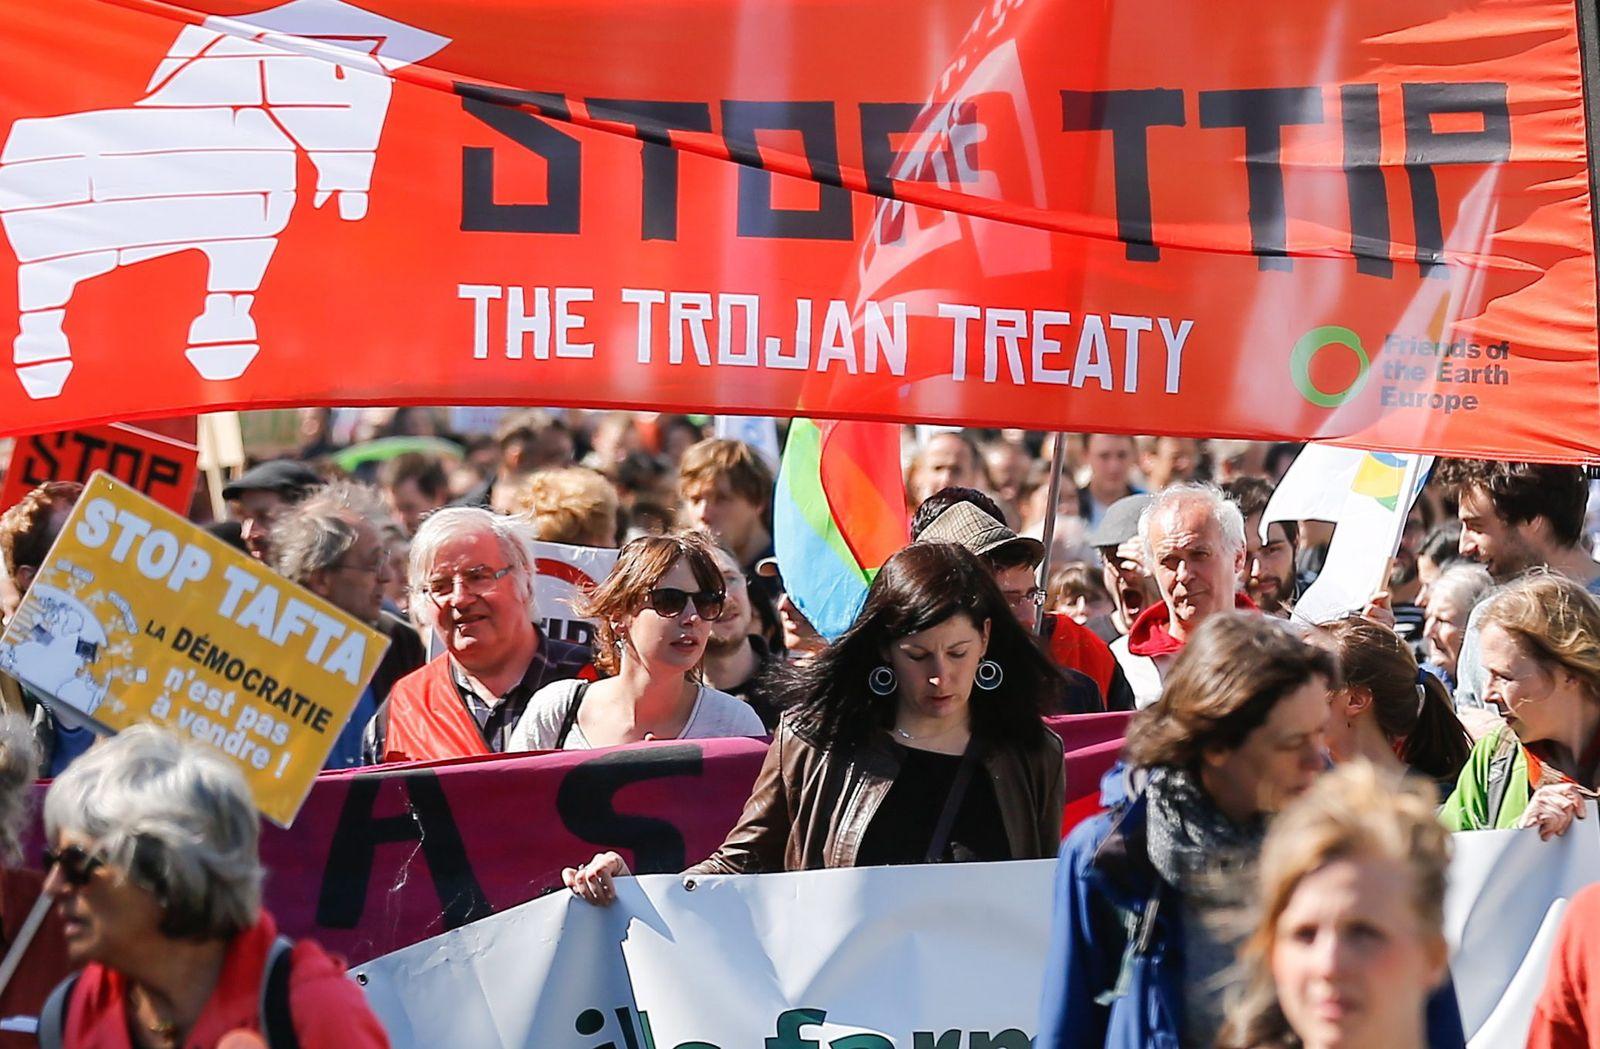 TTIP/ Freihandelsabkommen/ Demonstration/ Brussels